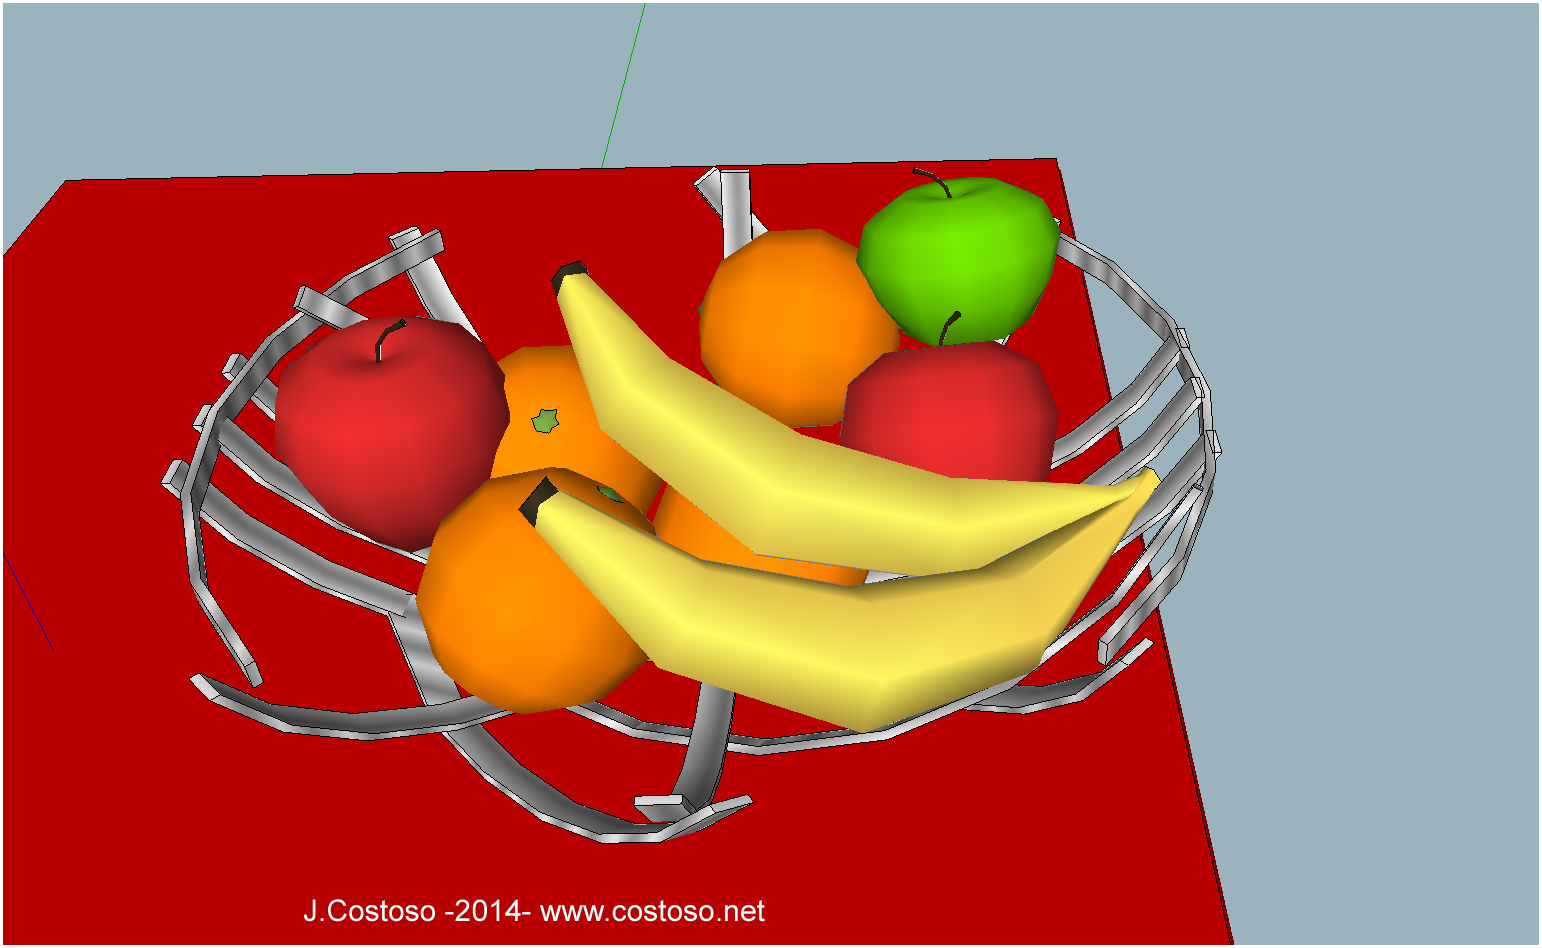 my gallery - Page 5 Soudplatfruit